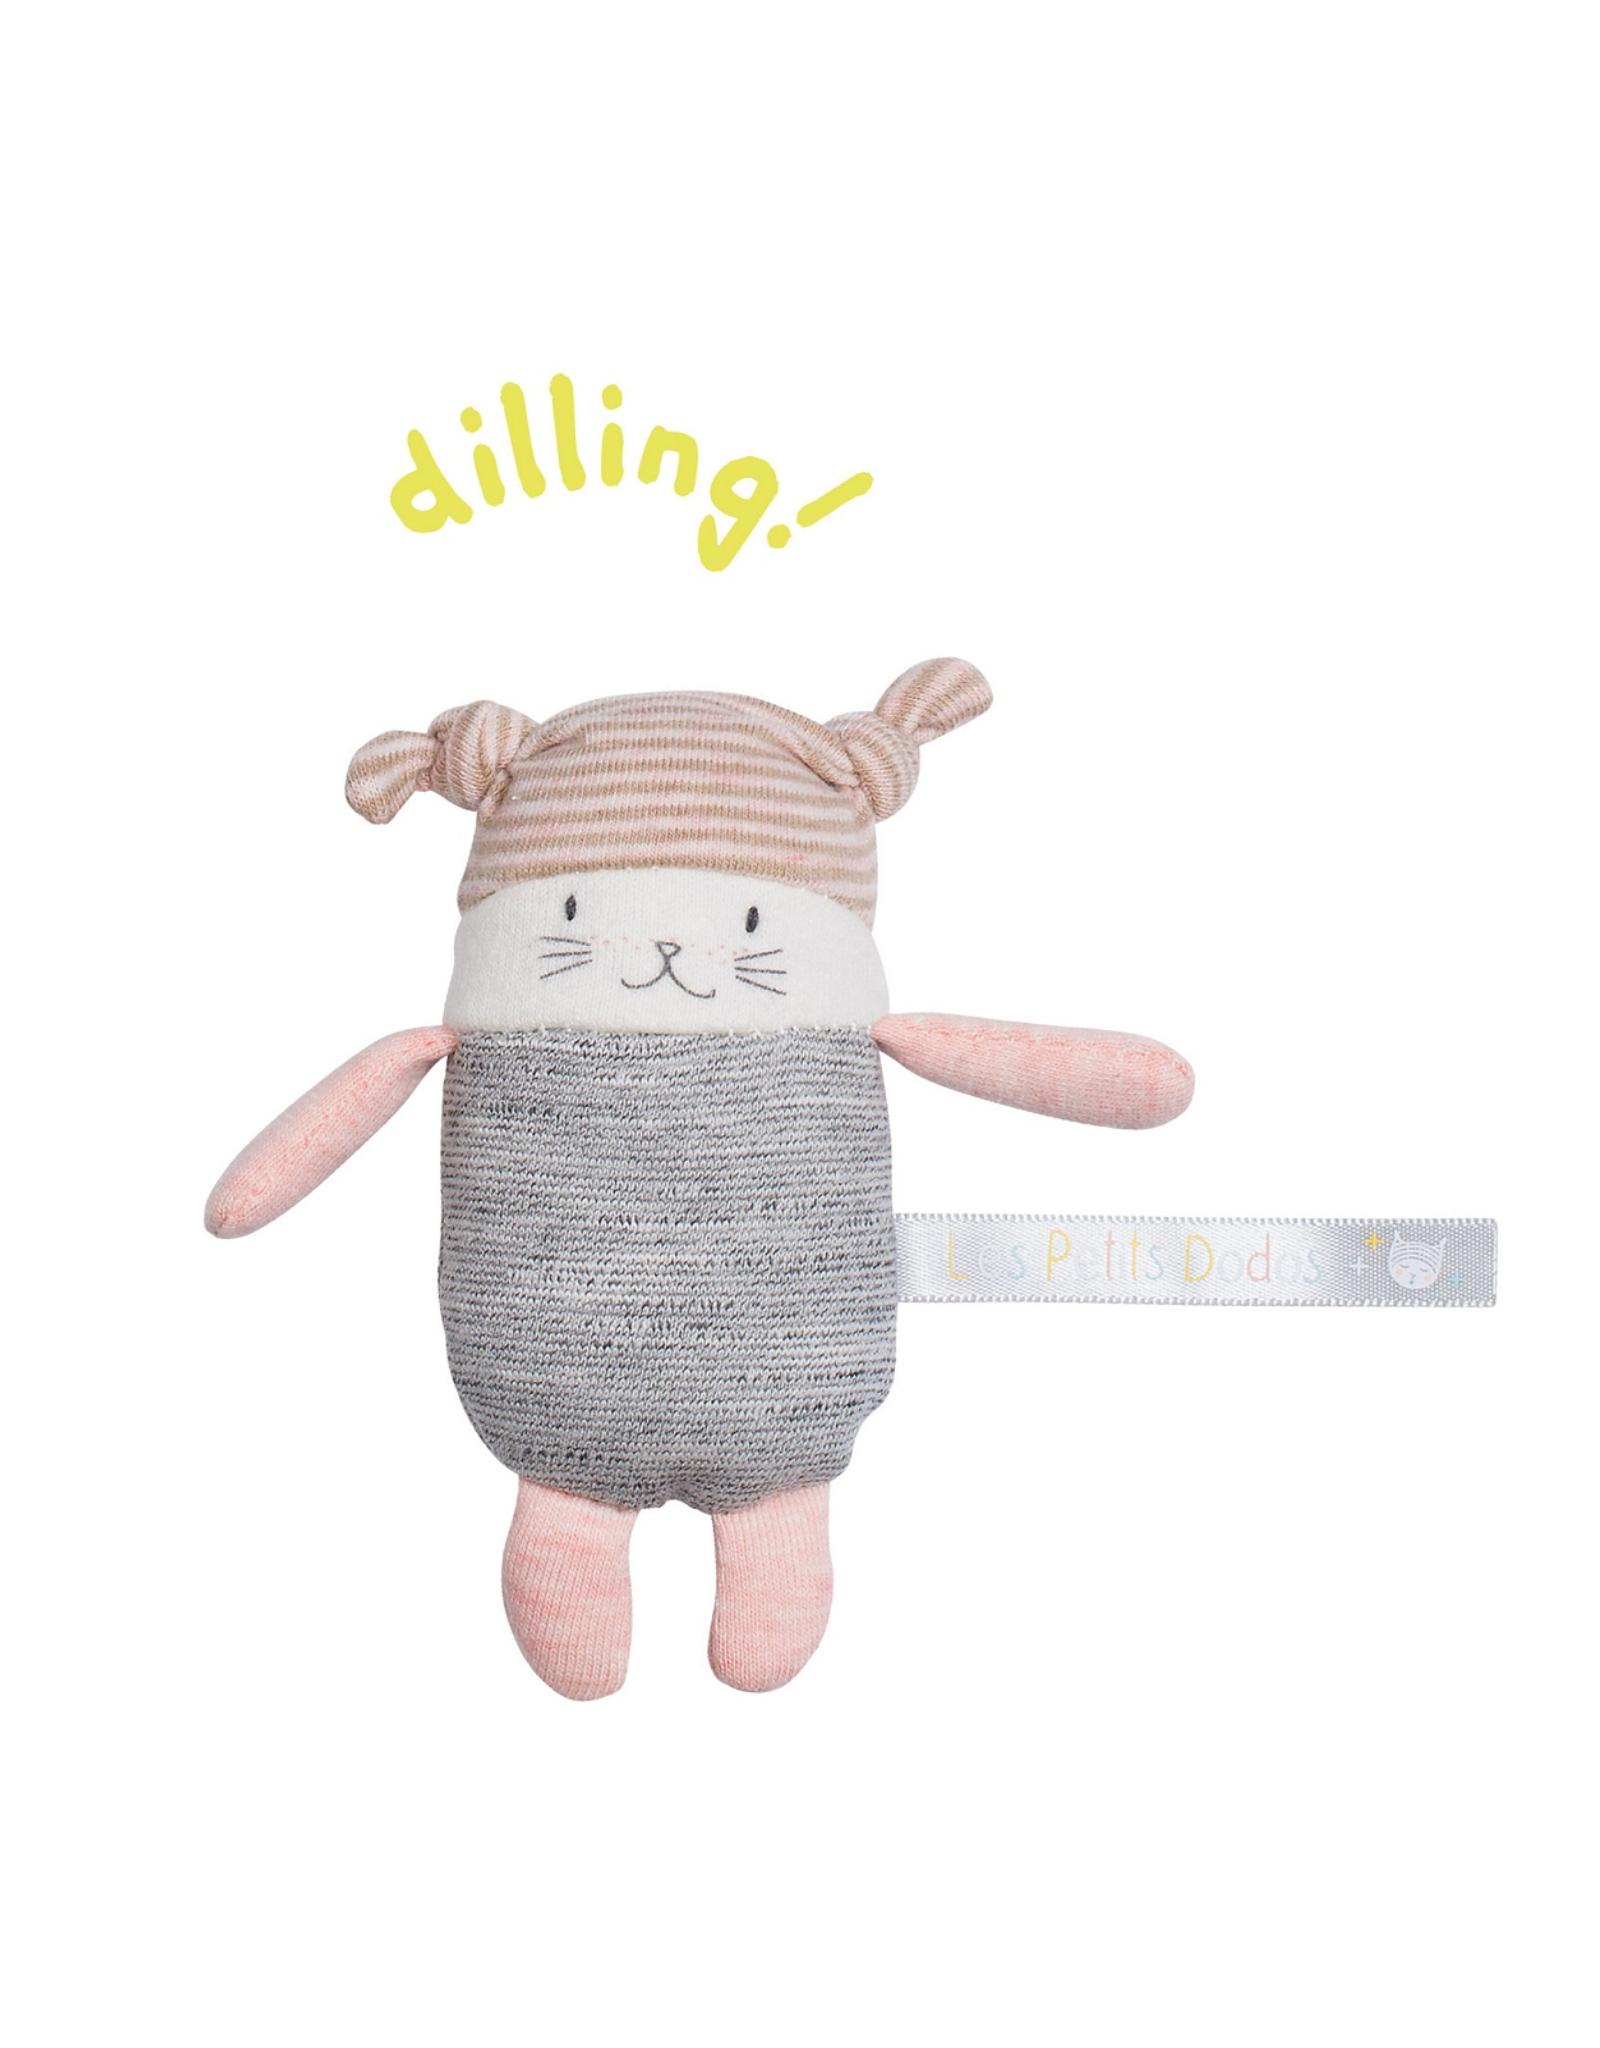 Moulin Roty  lune le petit chat hochet (11cm)